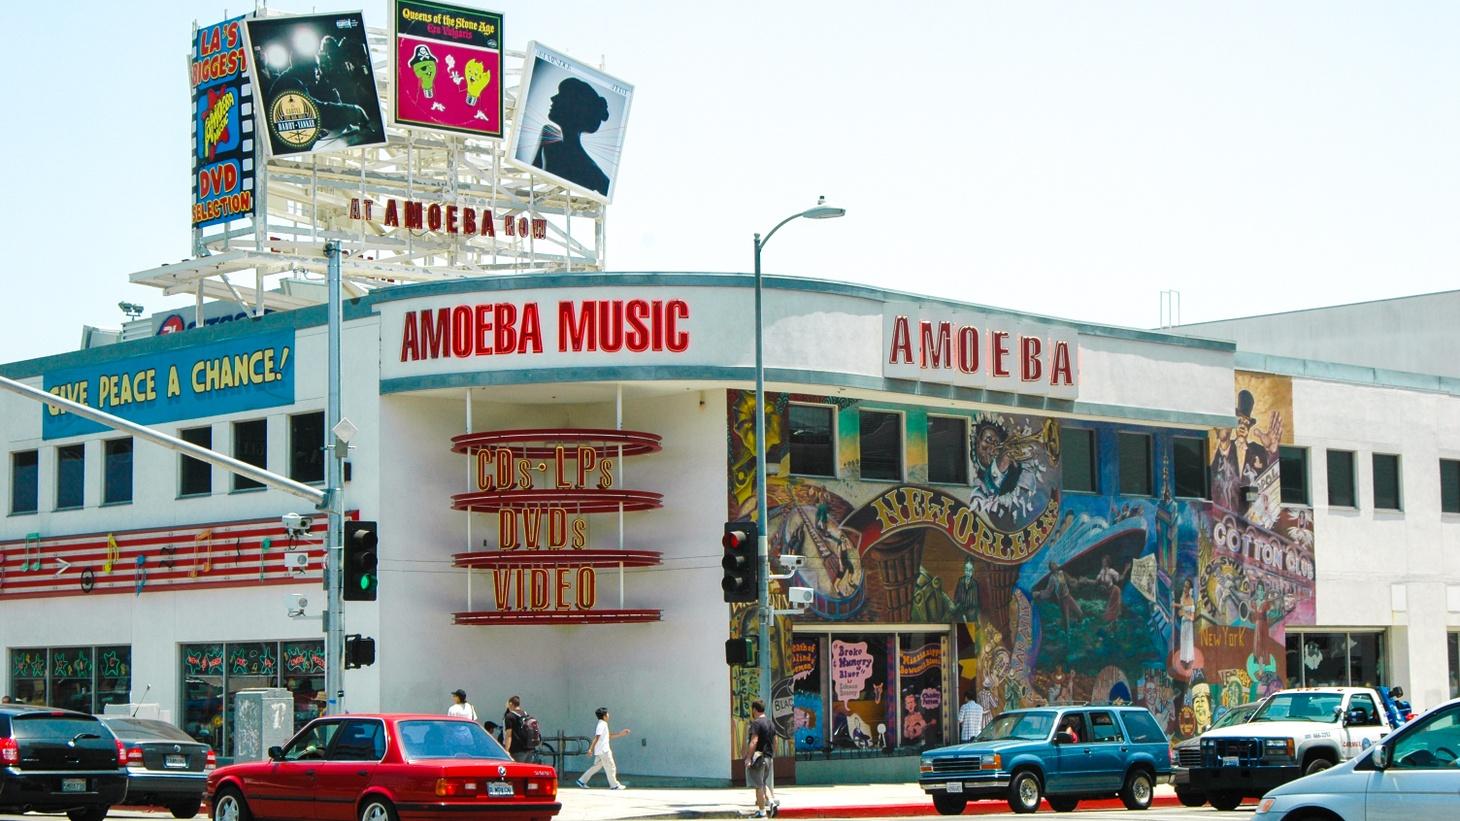 Amoeba Music Store in Hollywood, 2007.